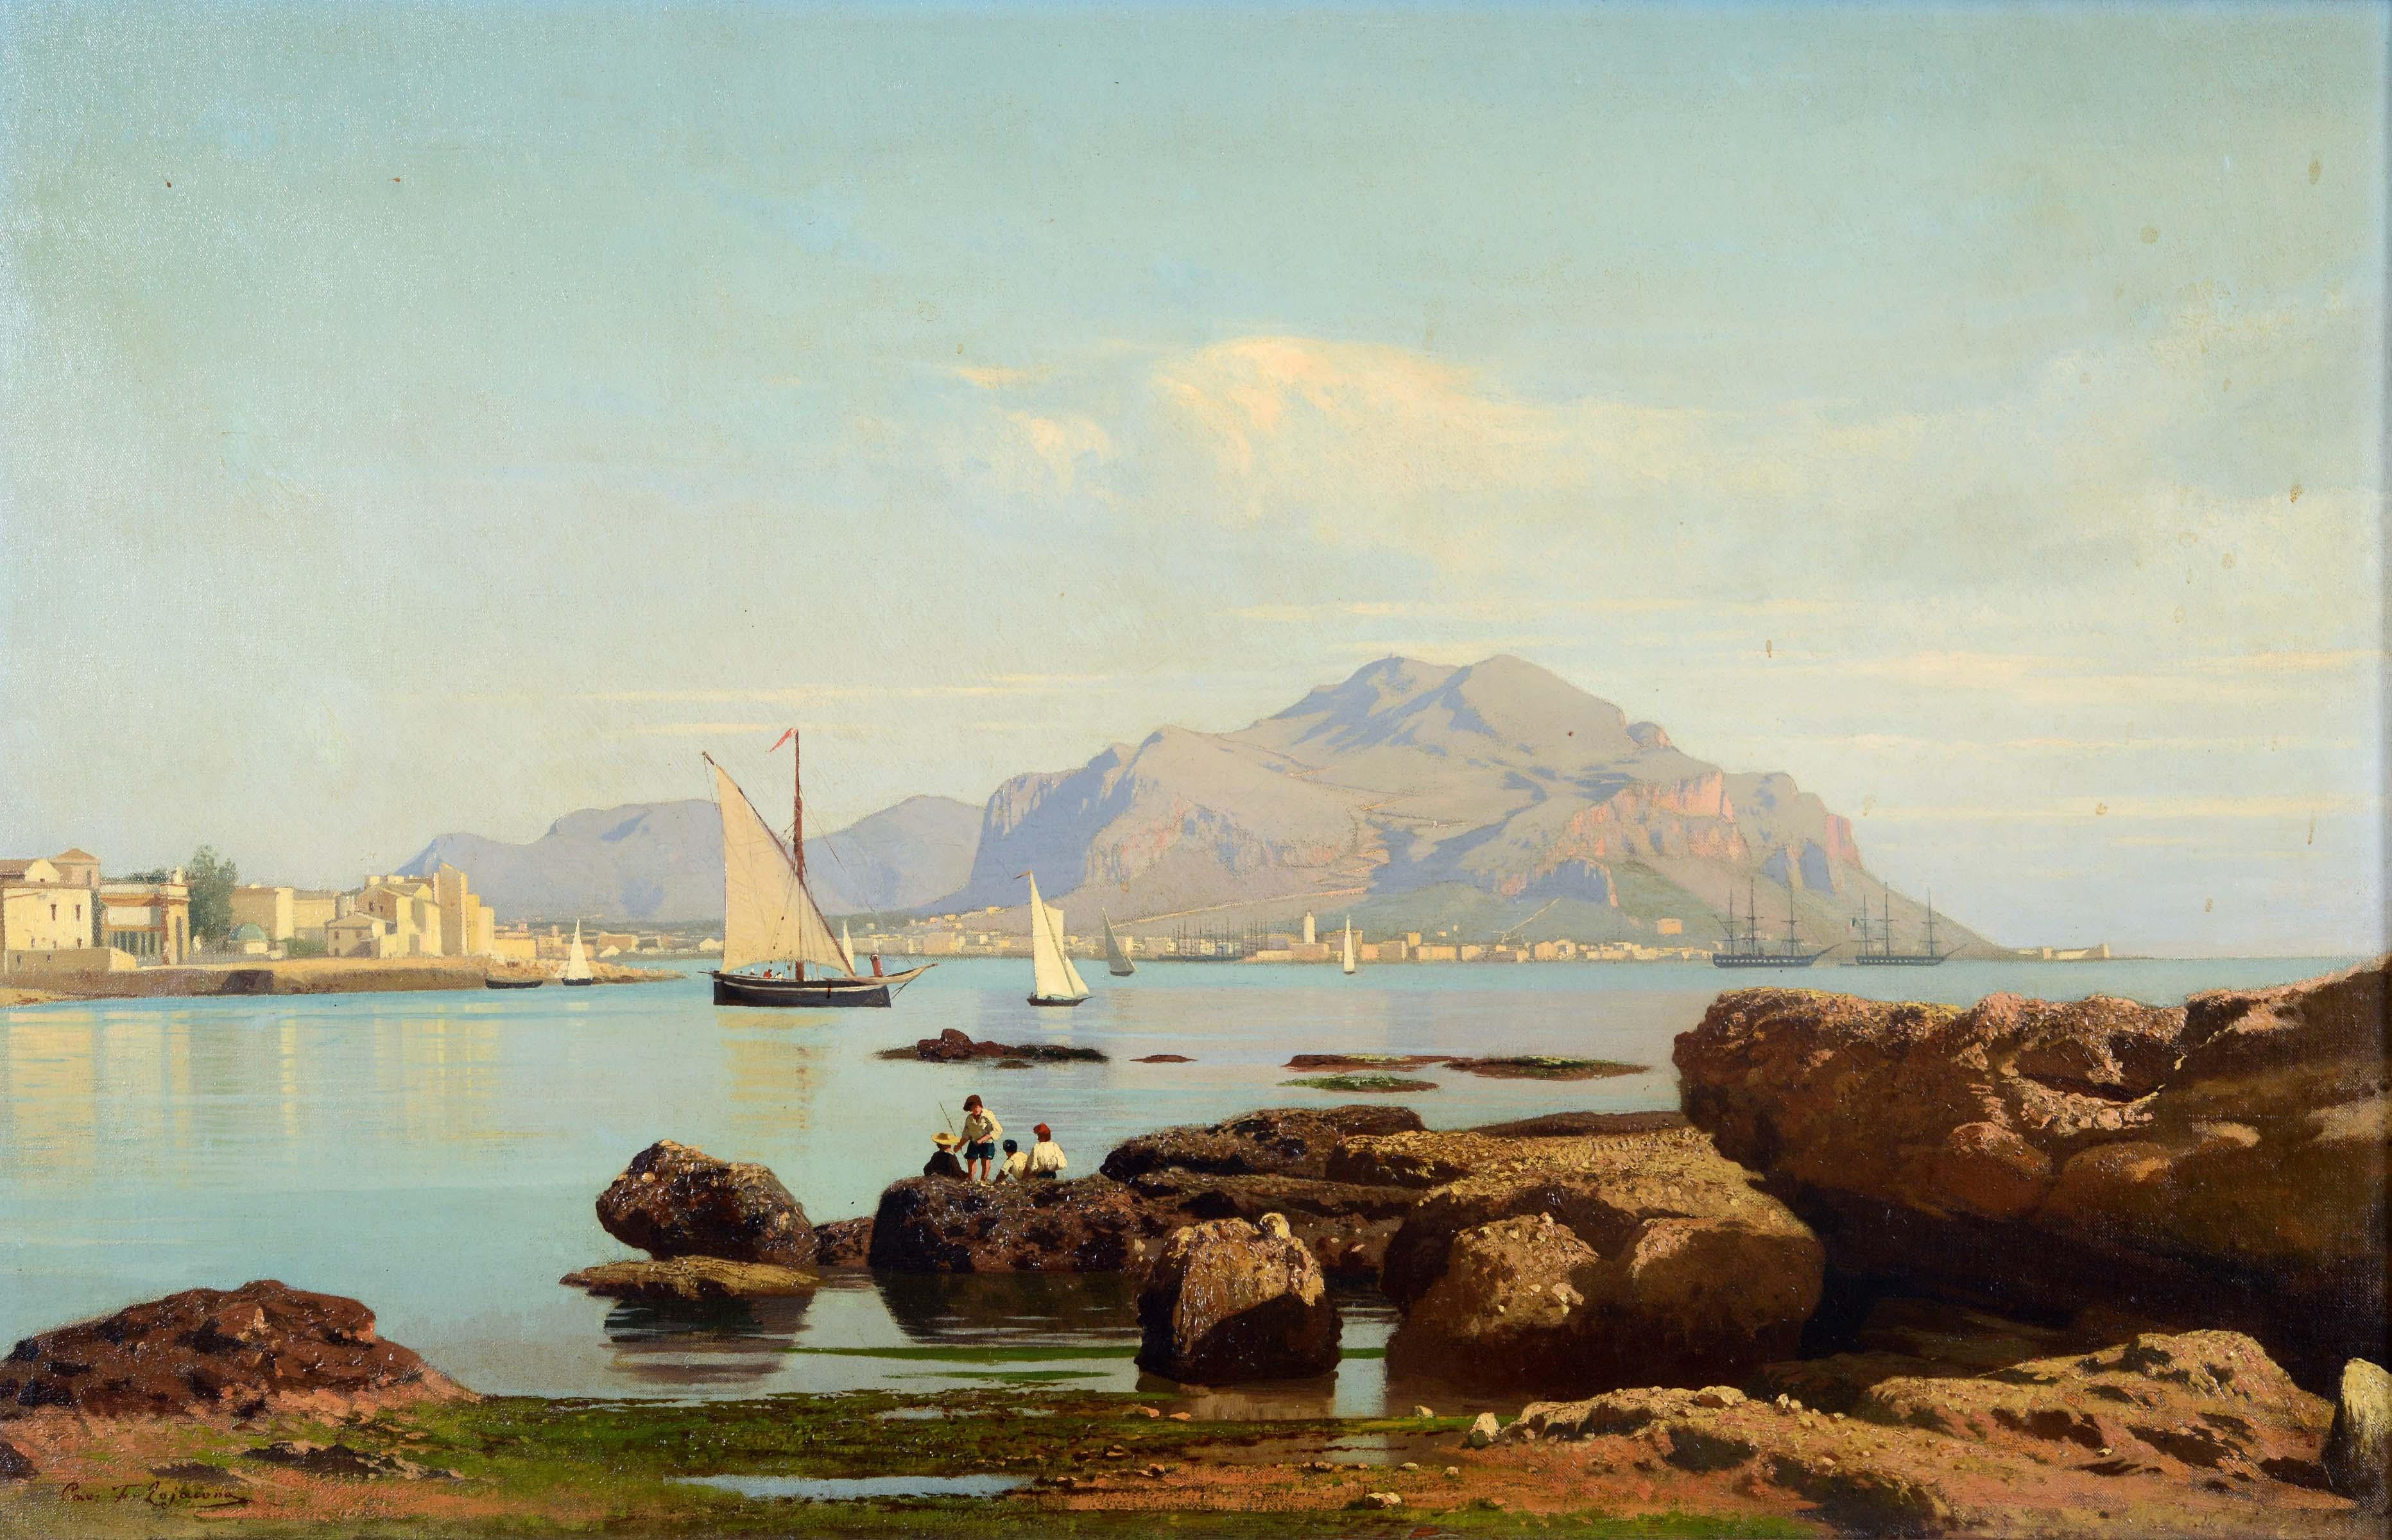 FRANCESCO LOJACONO (1838-1915) MONTE PELLEGRINO, BAY OF PALERMO, SICILY Signed, oil on canvas 48.5 x